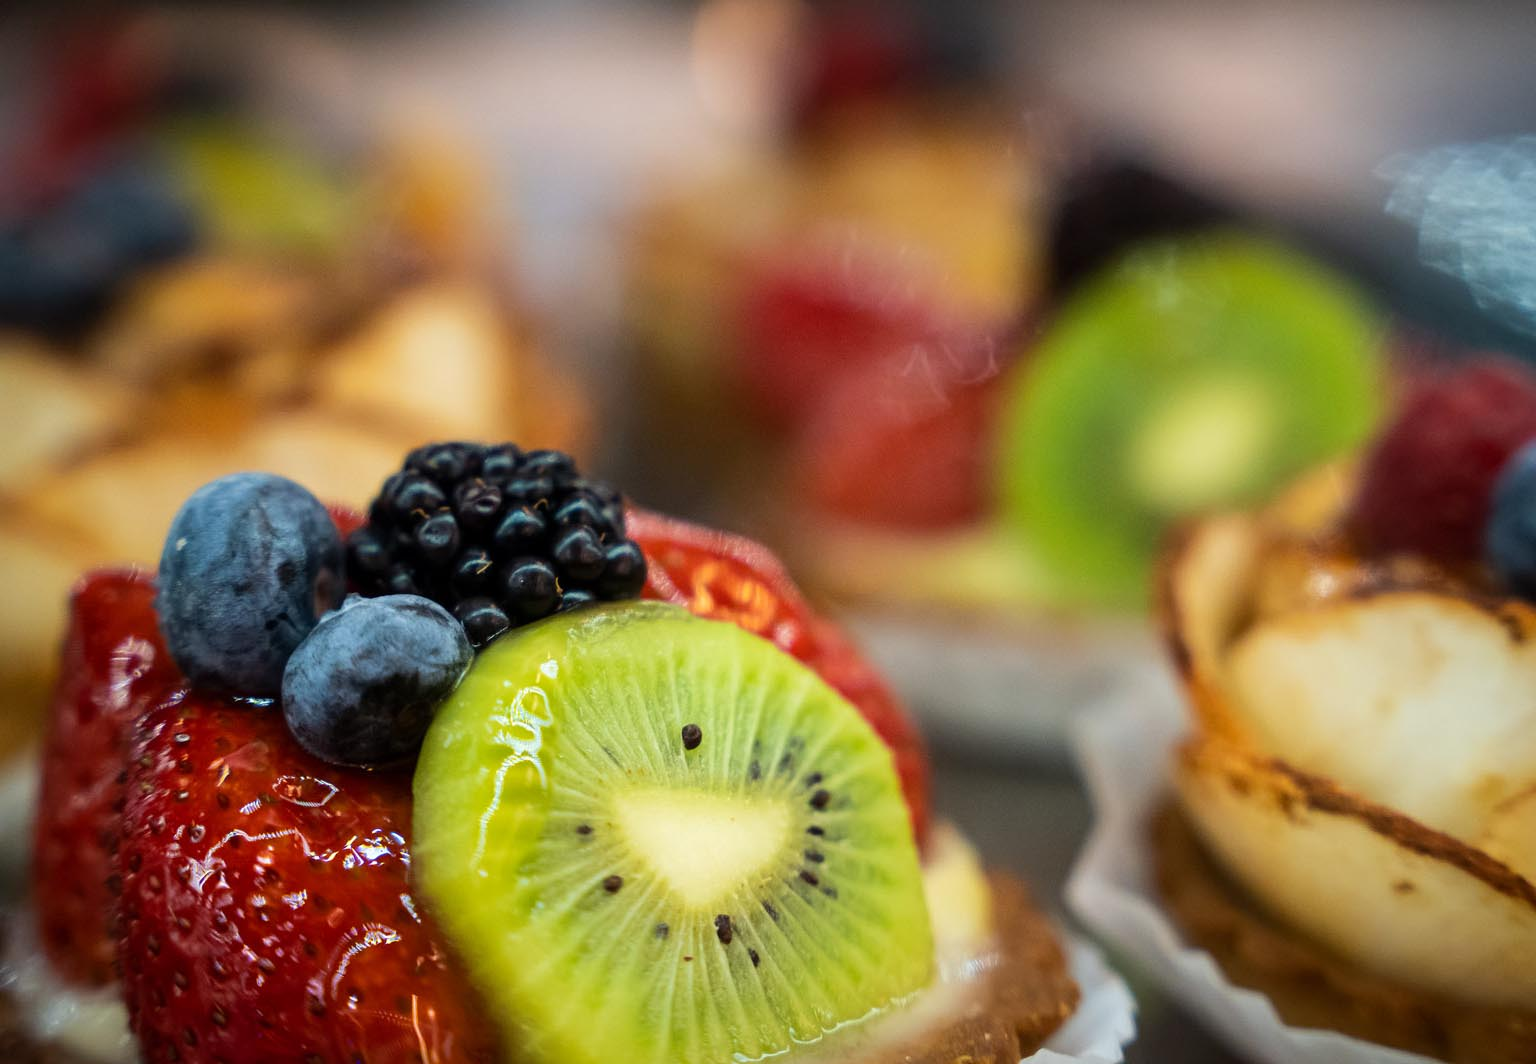 Food photo close-up taken with Sigma 24-70 Art lens